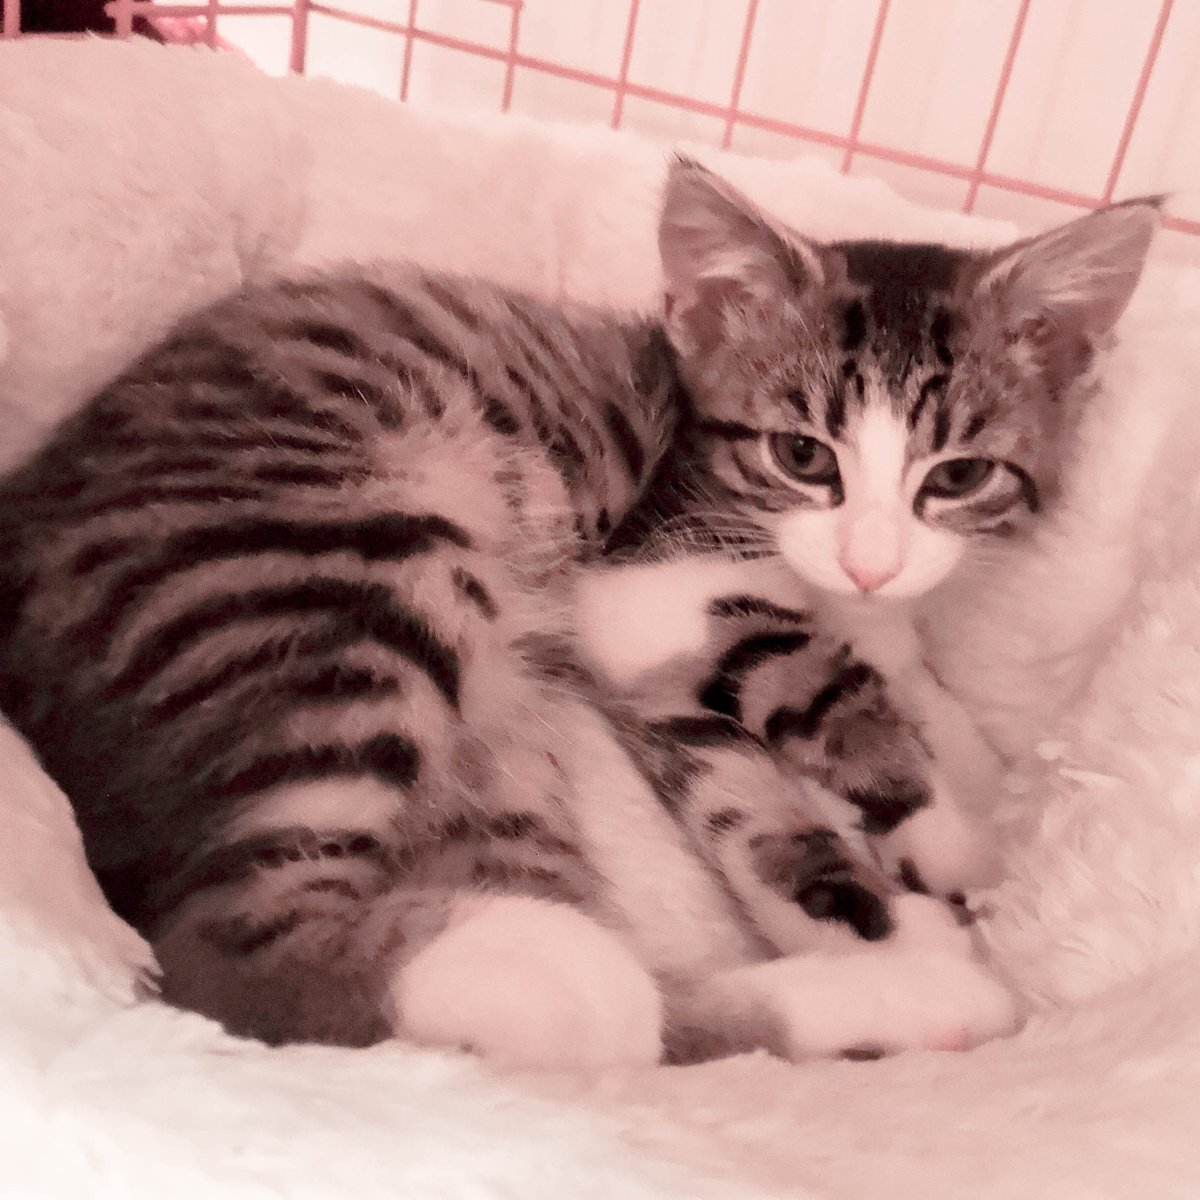 My bed is so comfy and cozy!  #CatsOfTwitter #TwitterCats #Cat #Kitten #Cute #TabbyCat #TabbyTroop #JoyOfCatspic.twitter.com/QIluBT2D99